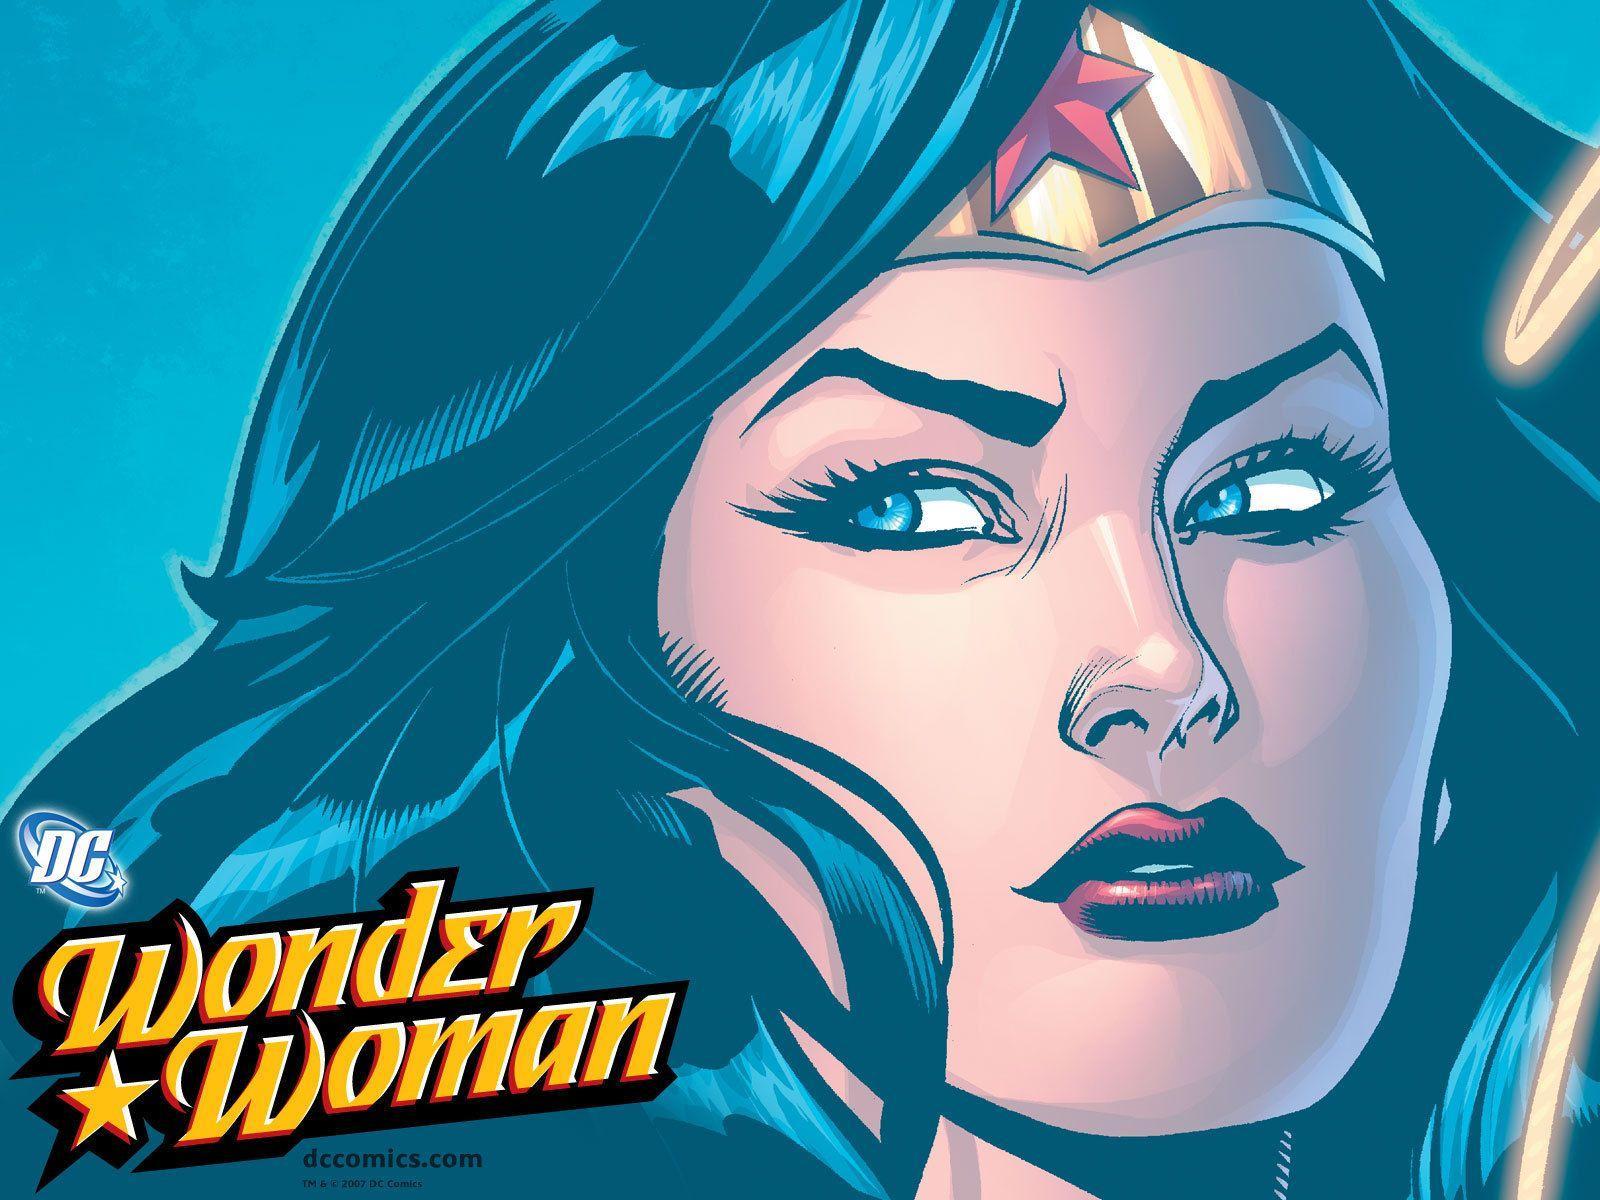 Wonder Wallpaper - Wonder Woman Wallpaper (3409904) - Fanpop